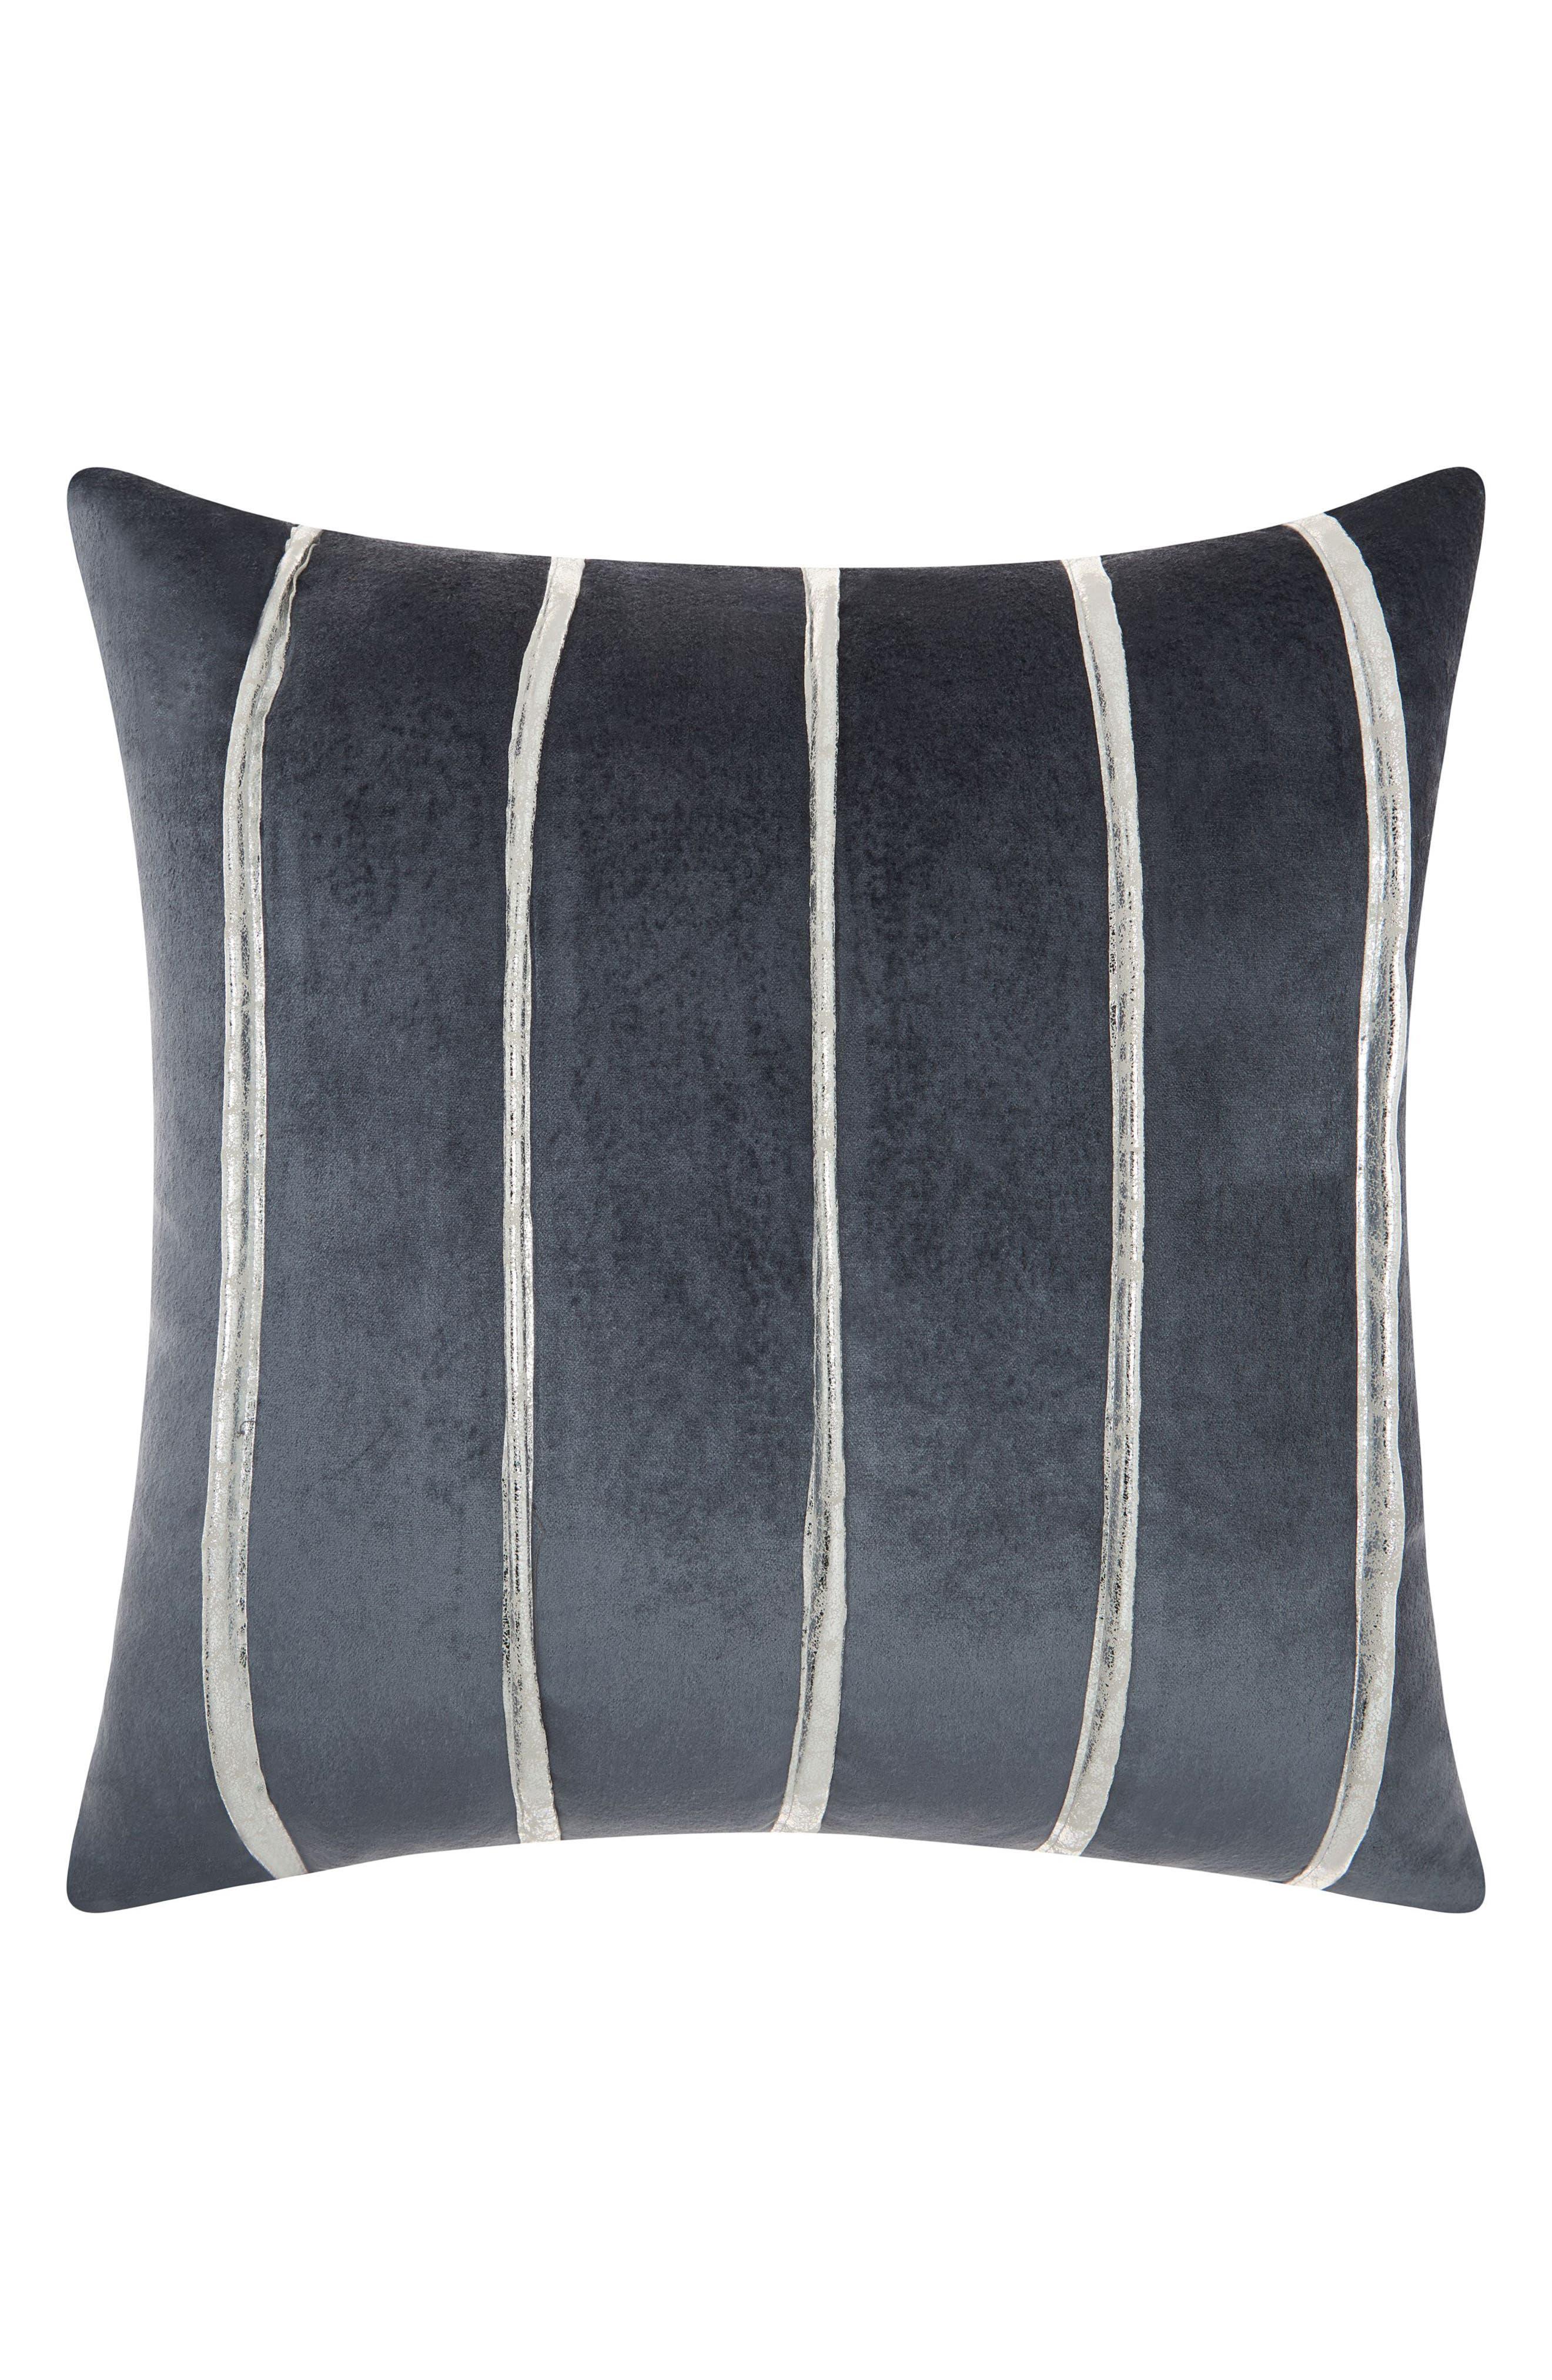 Shop home decor chevron stripes pillow from shop home decor - Shop Home Decor Chevron Stripes Pillow From Shop Home Decor 35